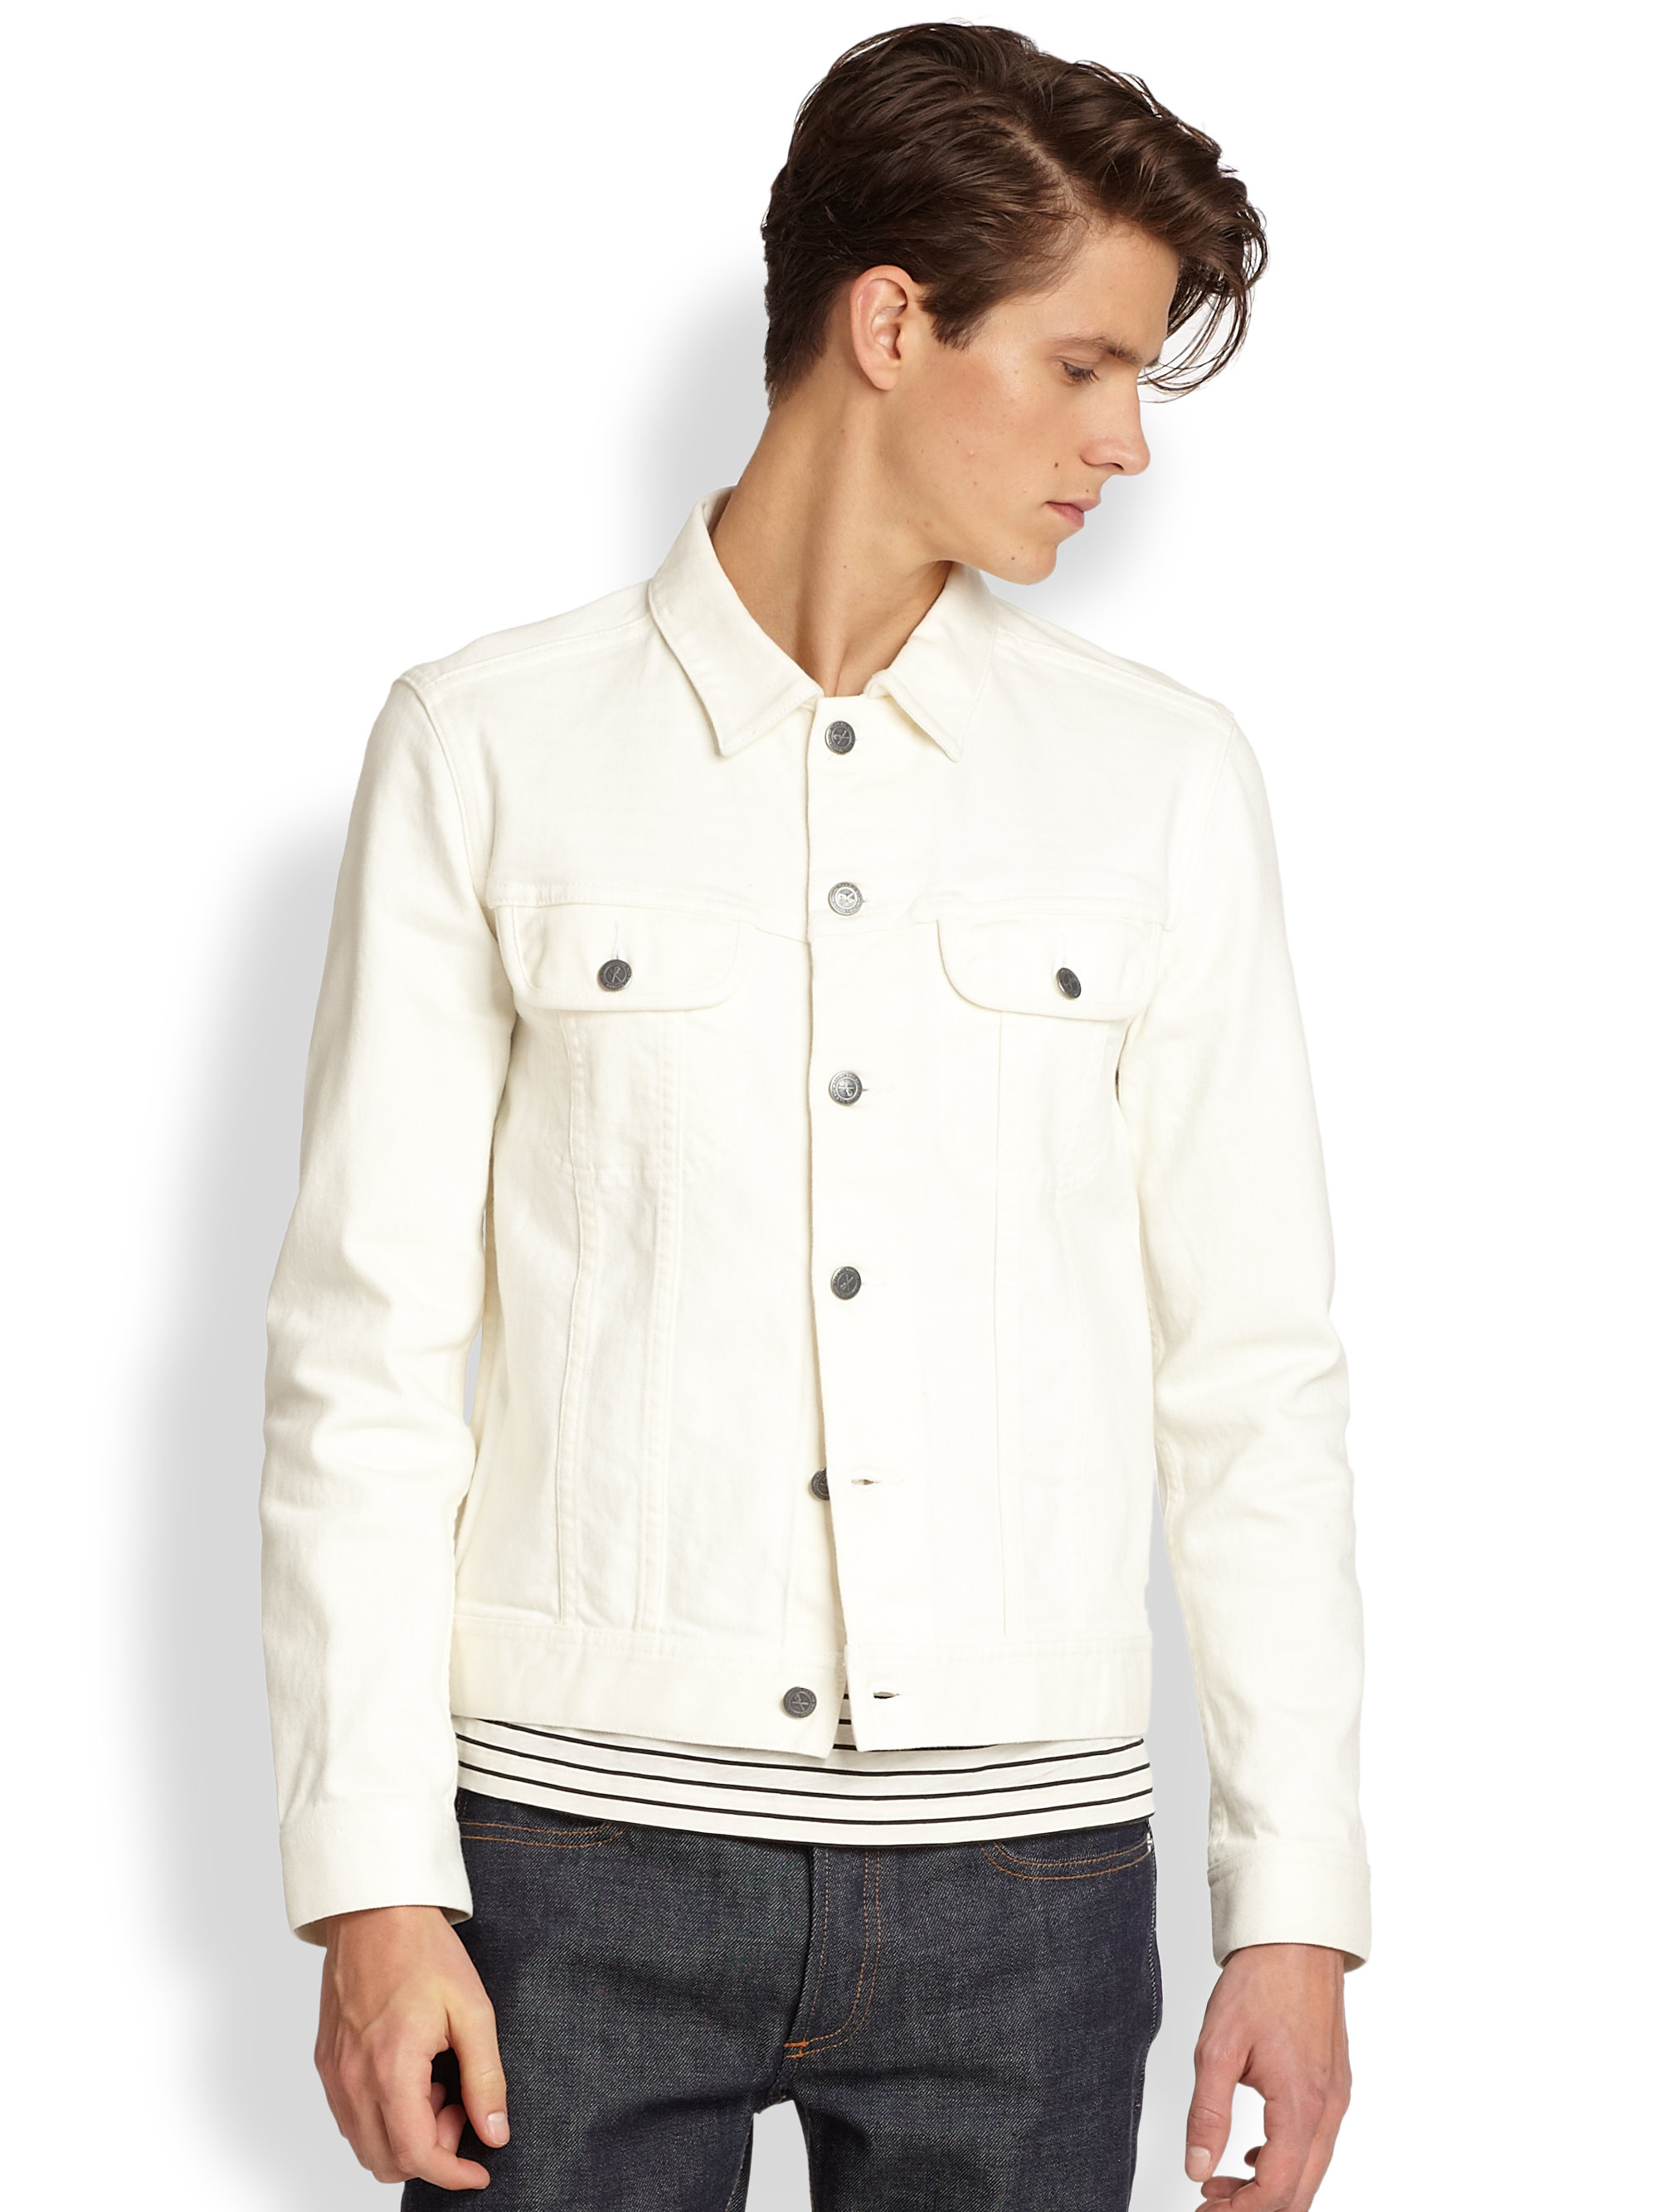 A.p.c. Denim Jacket in White for Men | Lyst